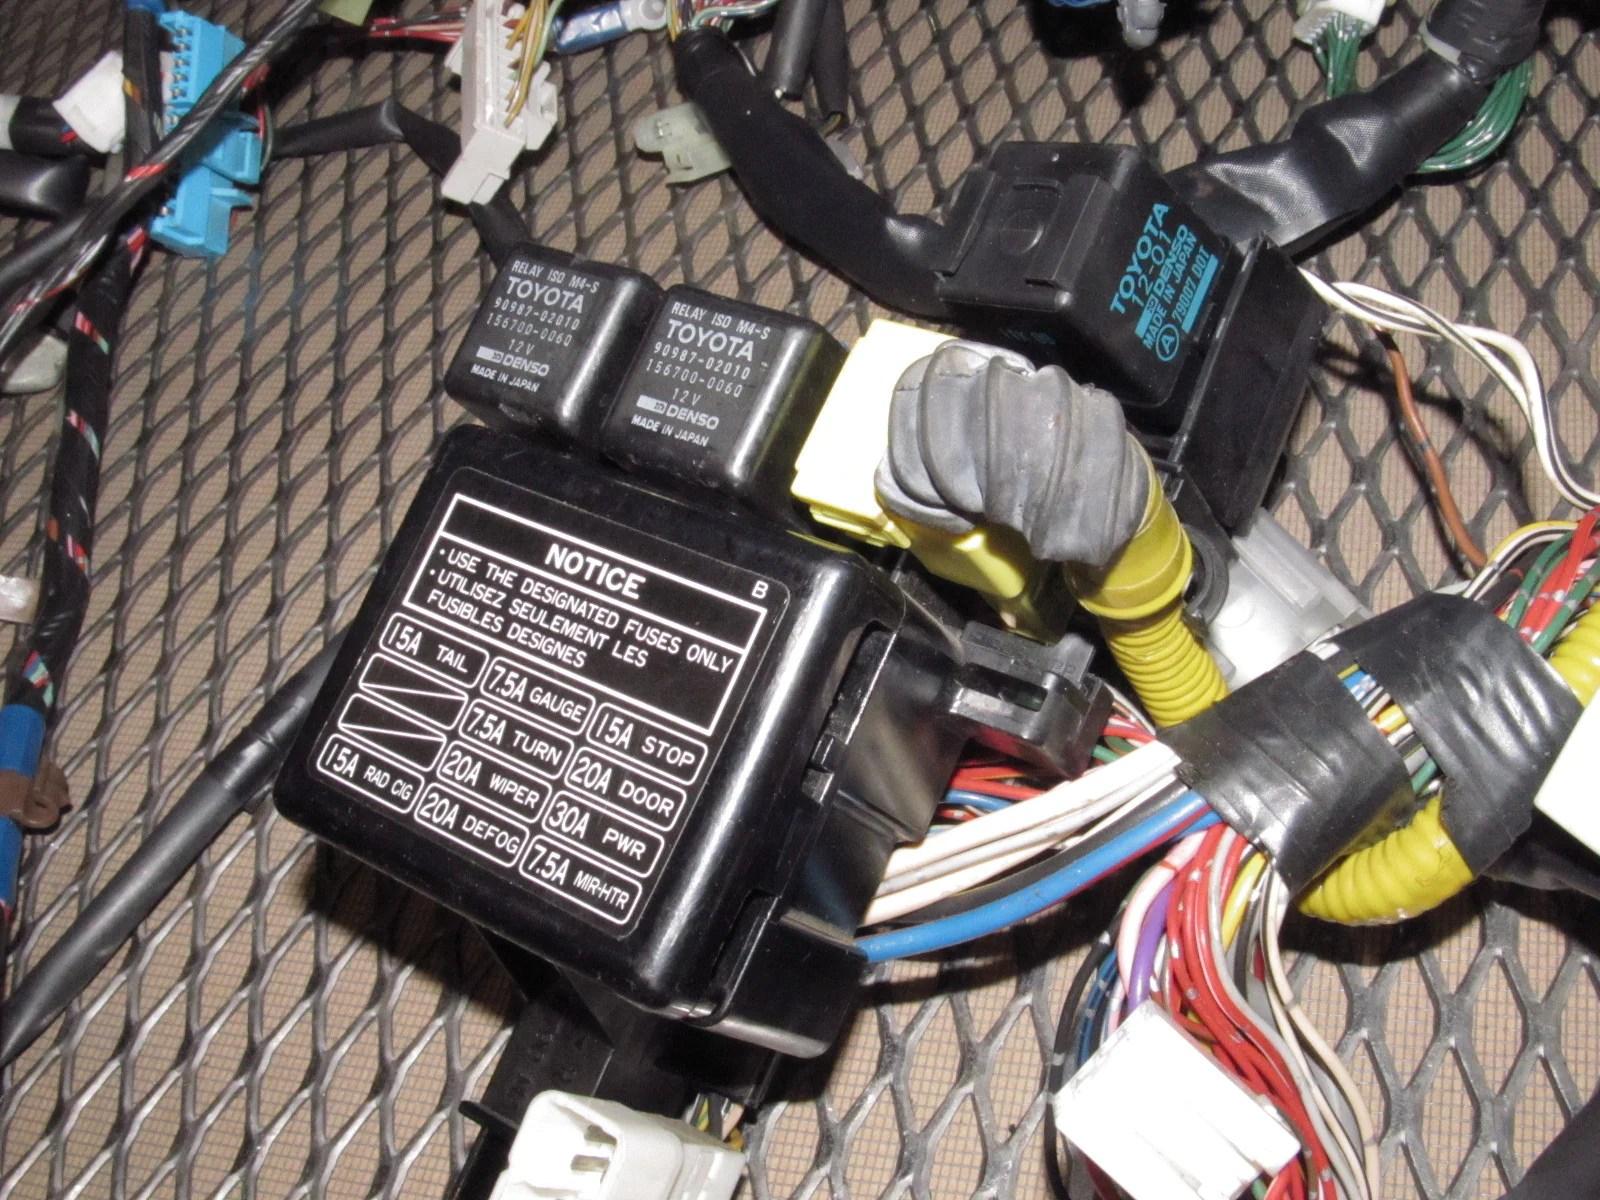 medium resolution of 1993 toyota mr2 wiring harness wiring diagram used 1993 toyota mr2 wiring harness